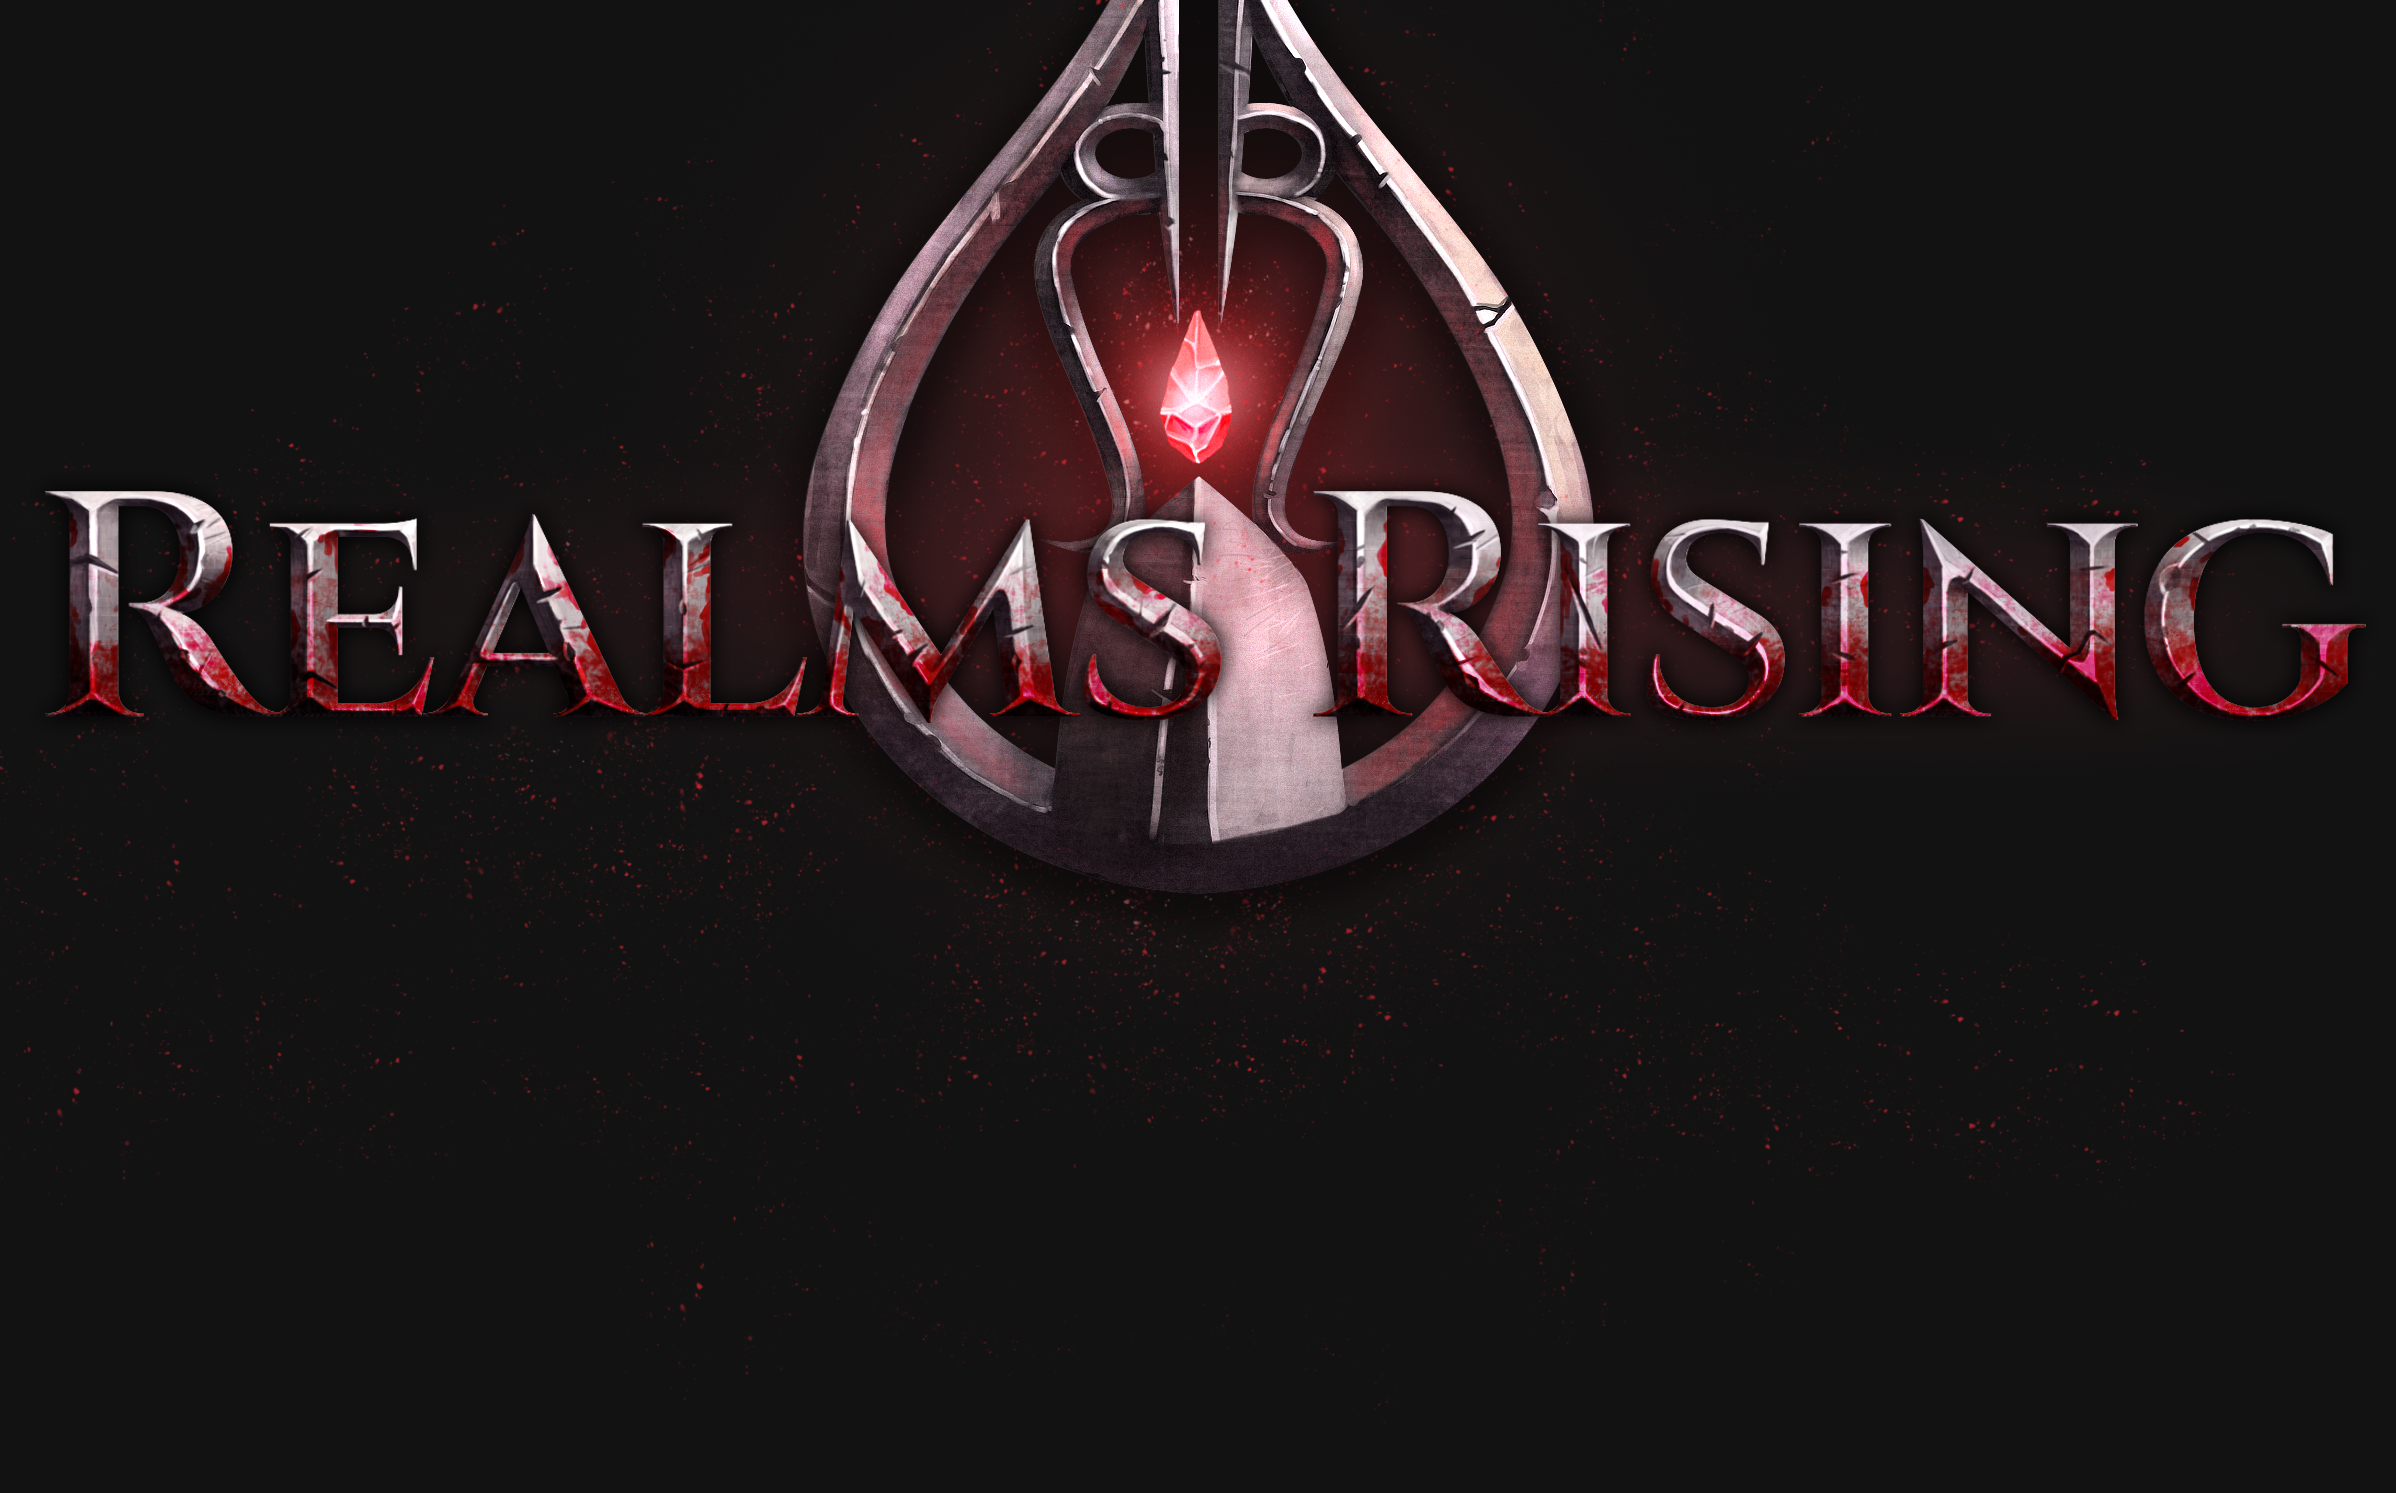 Realms Rising